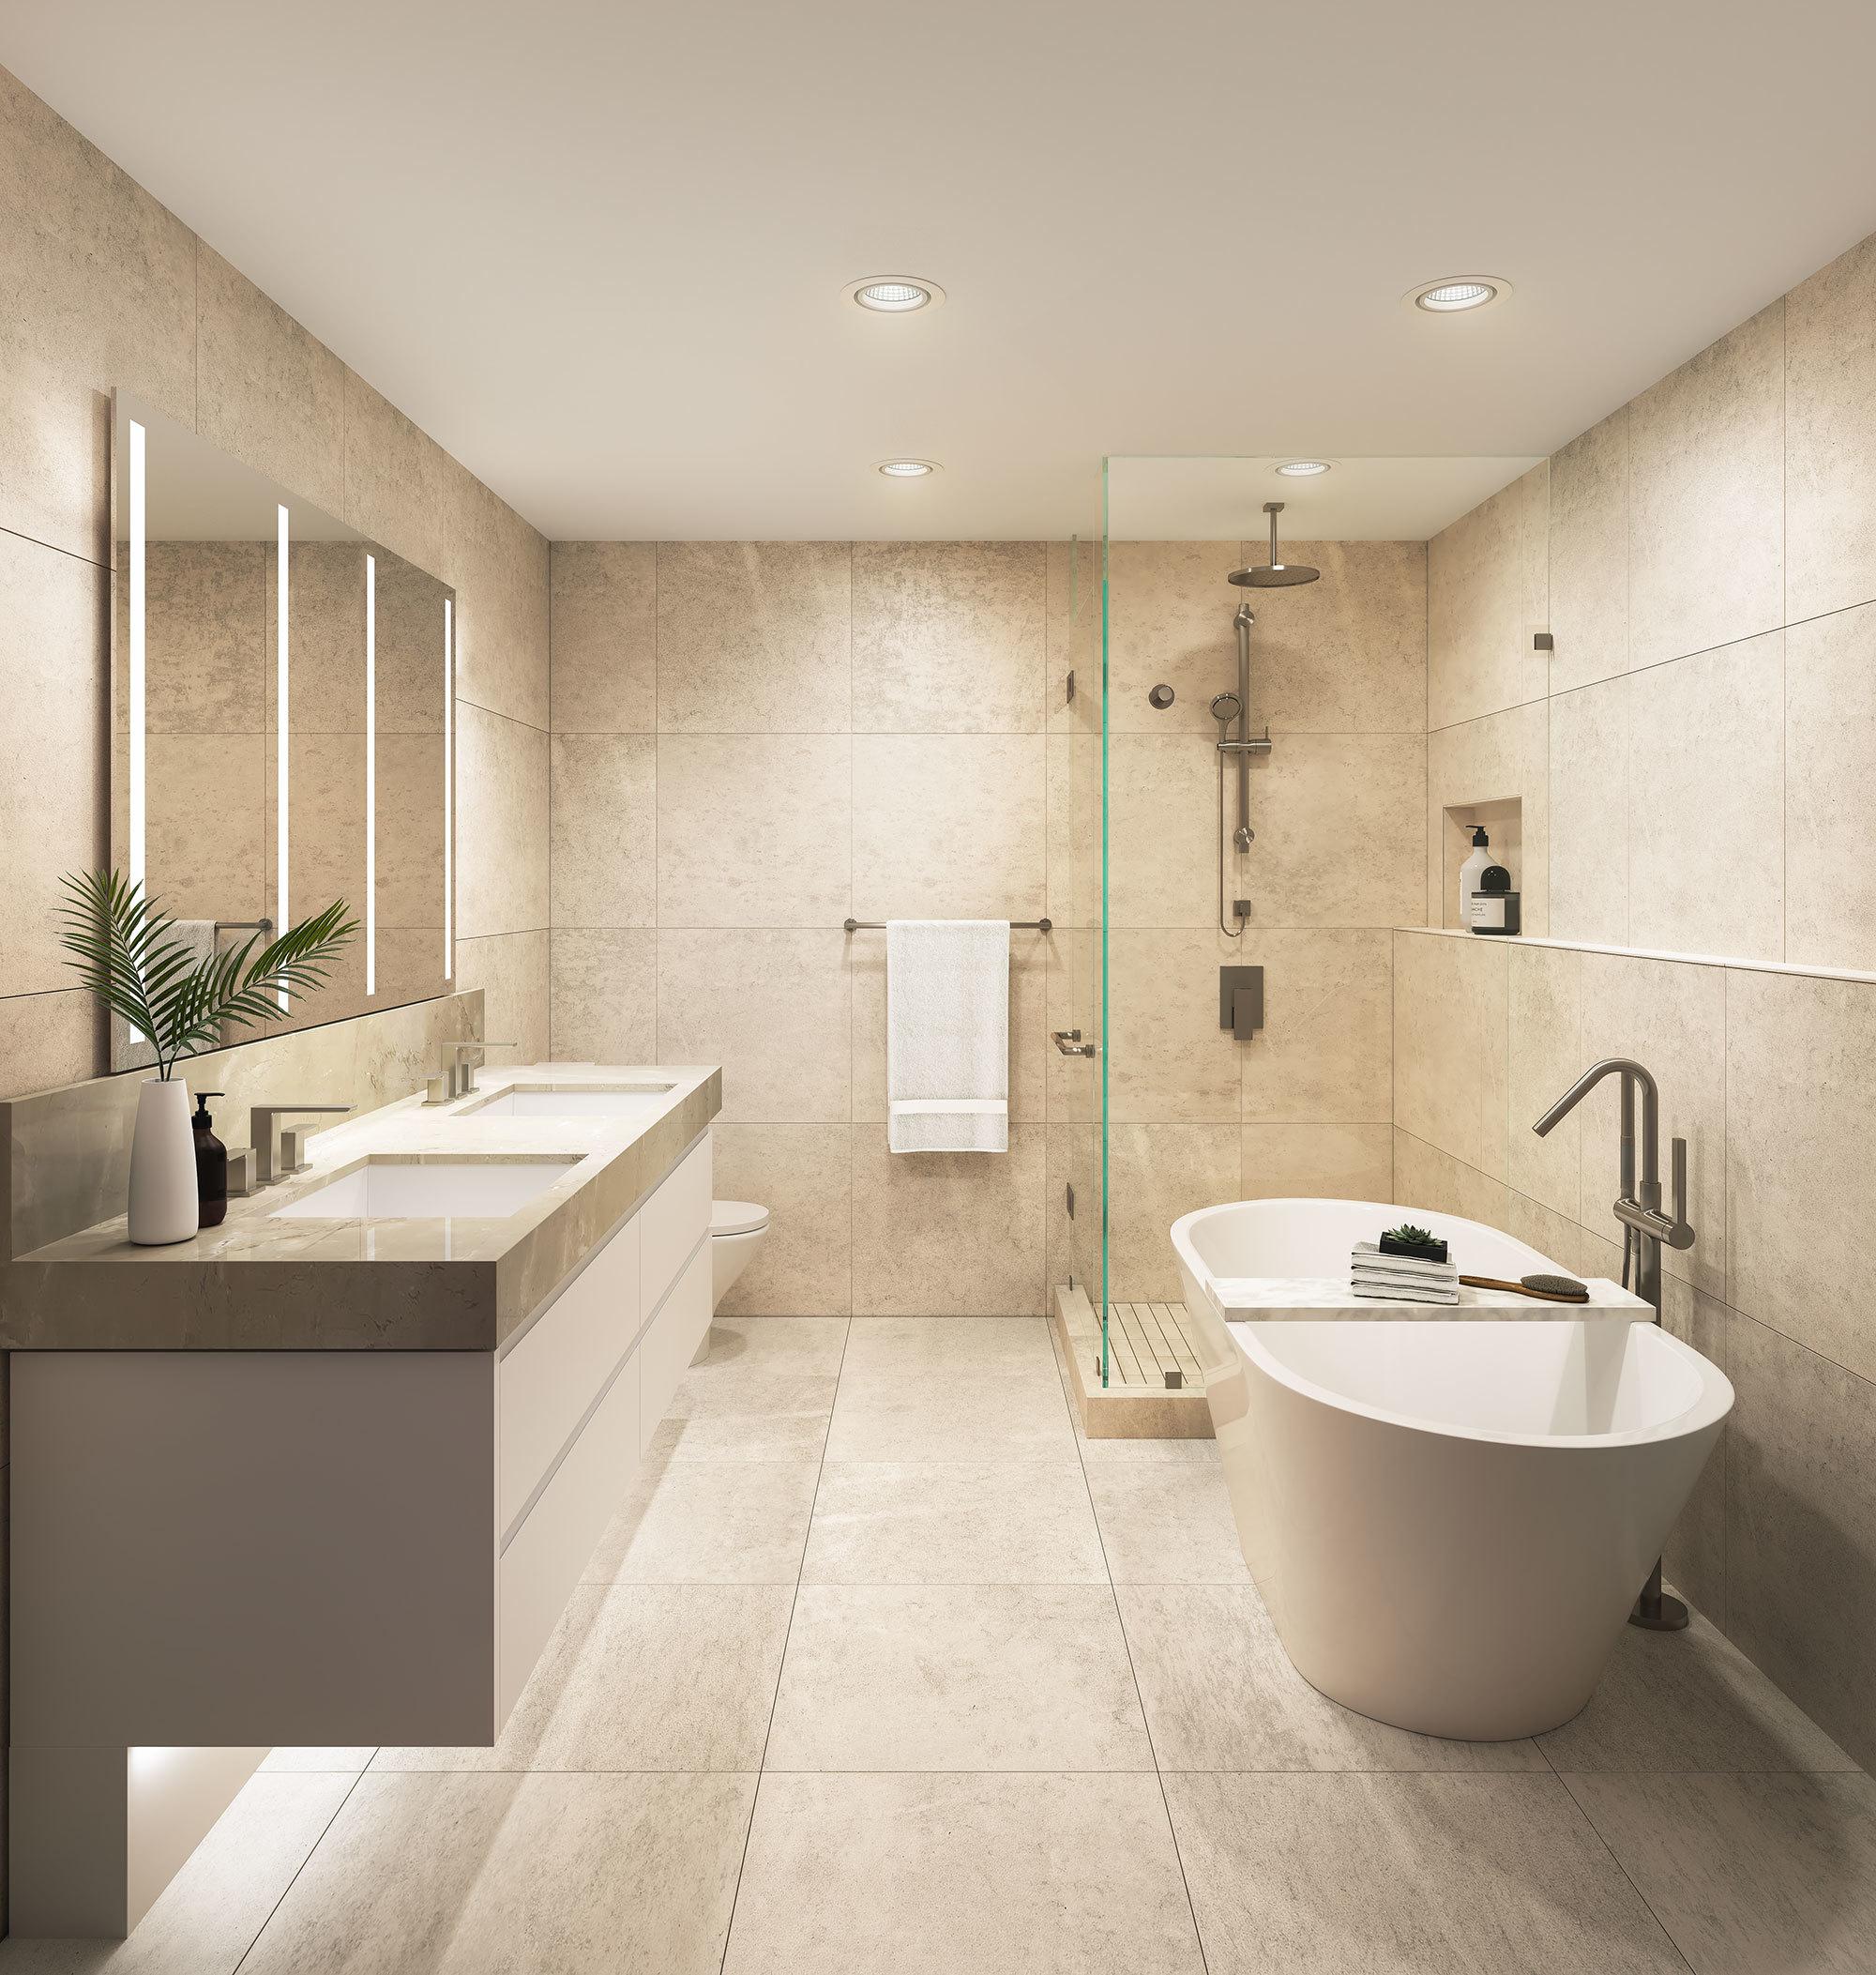 Cambie Gardens bath.jpg